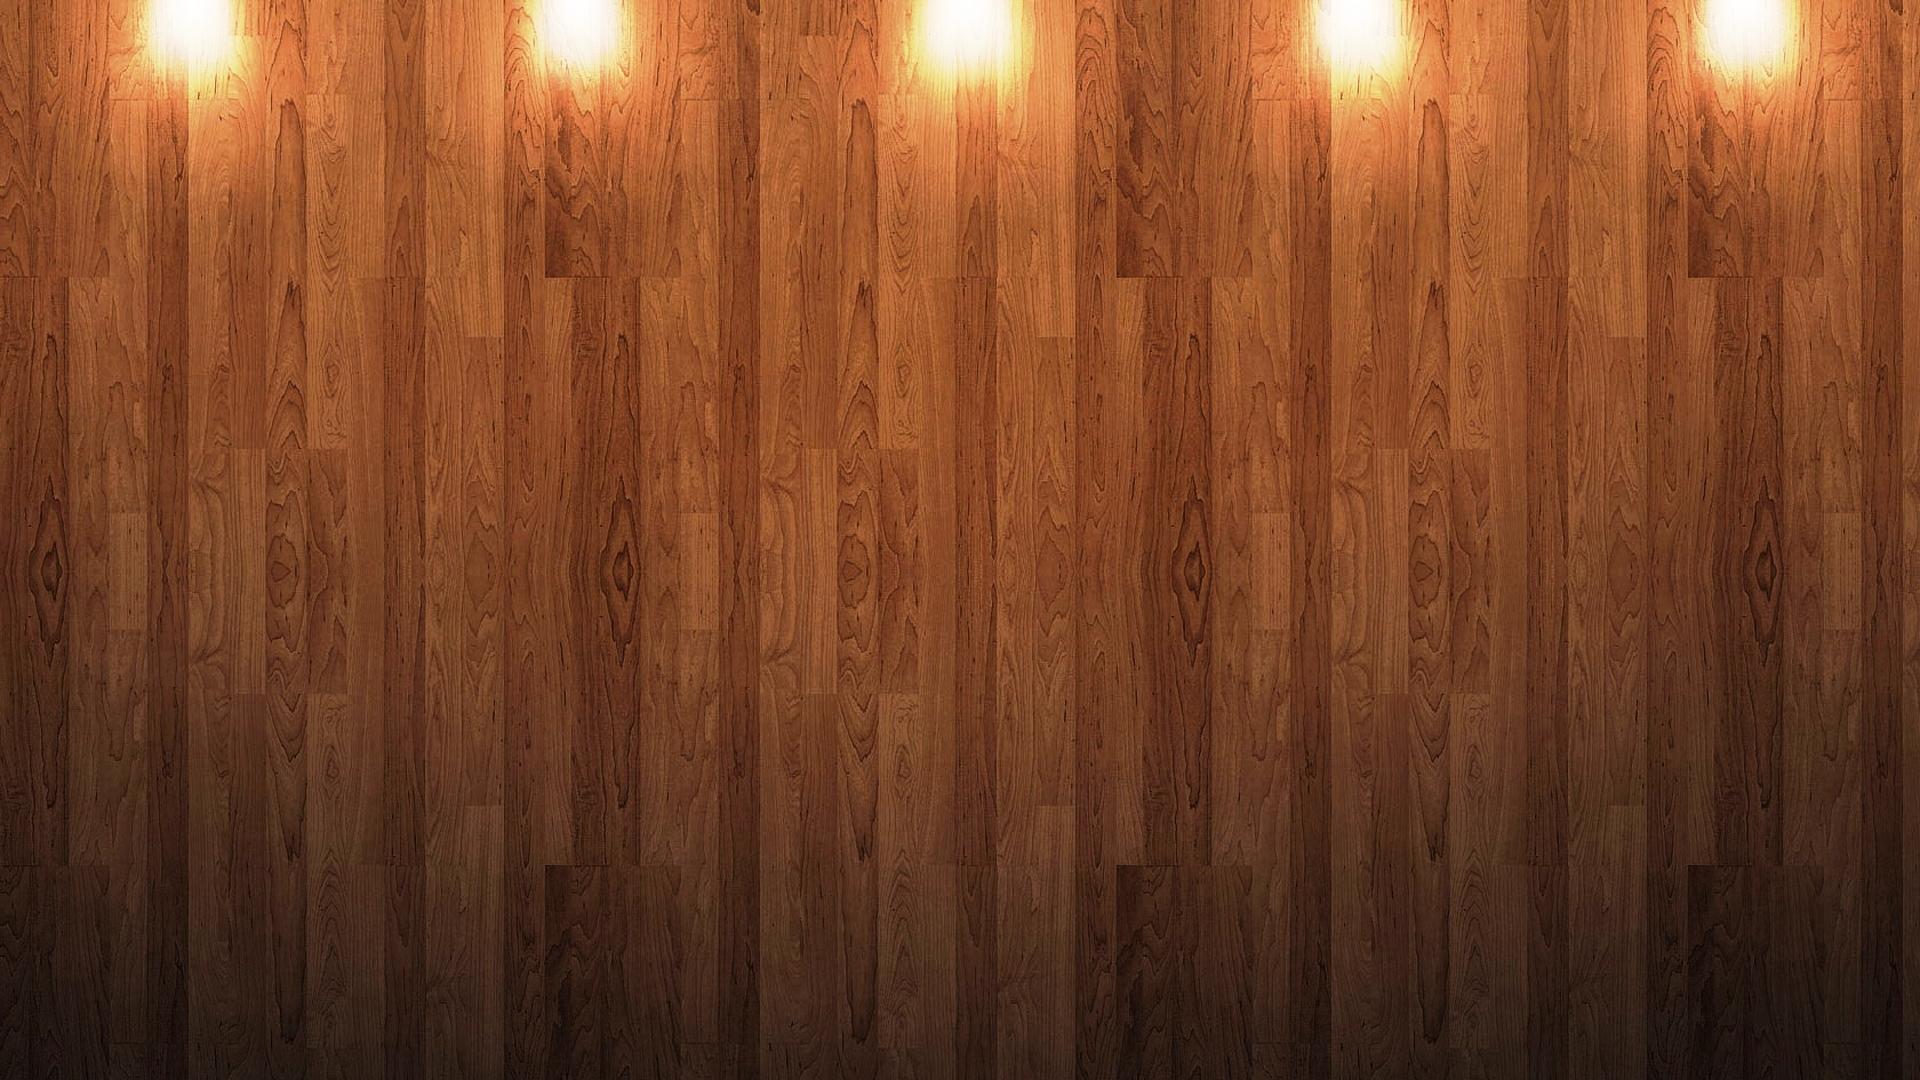 Hd wallpaper wood - Wood Wallpaper Background 9